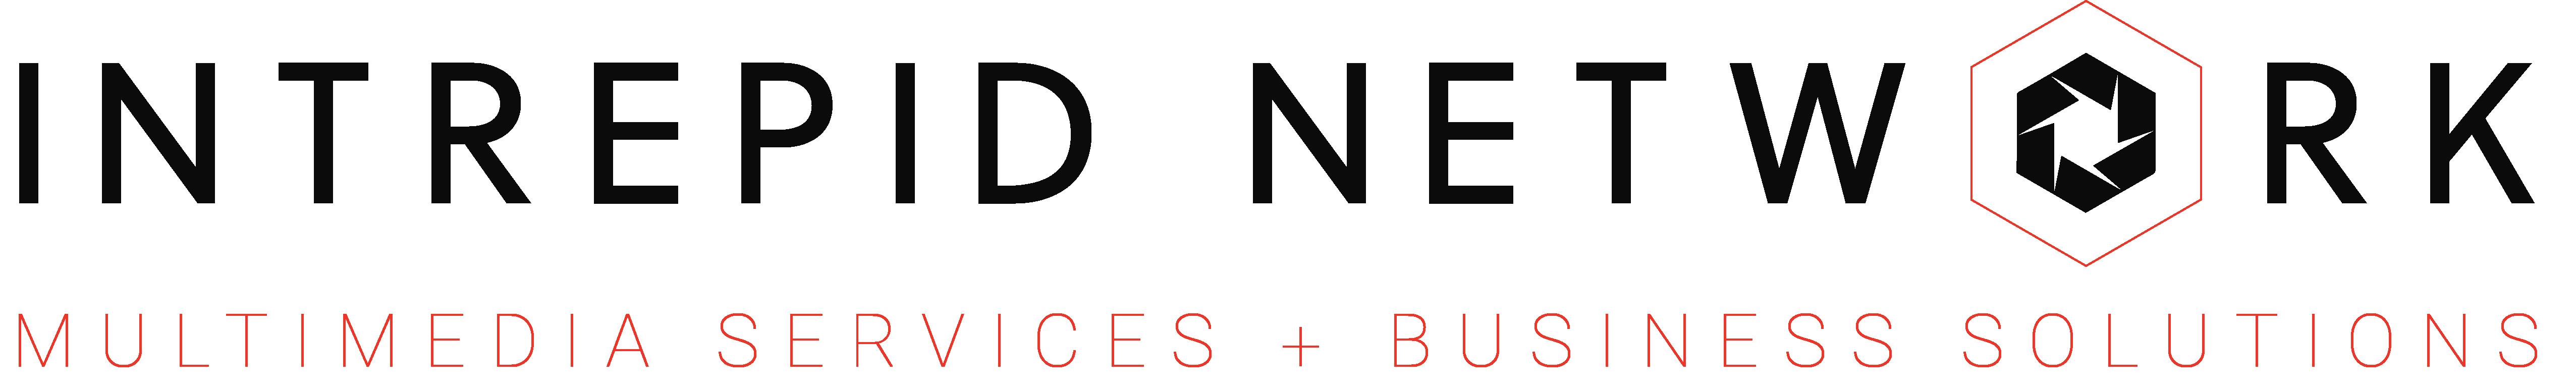 Intrepid Network Inc